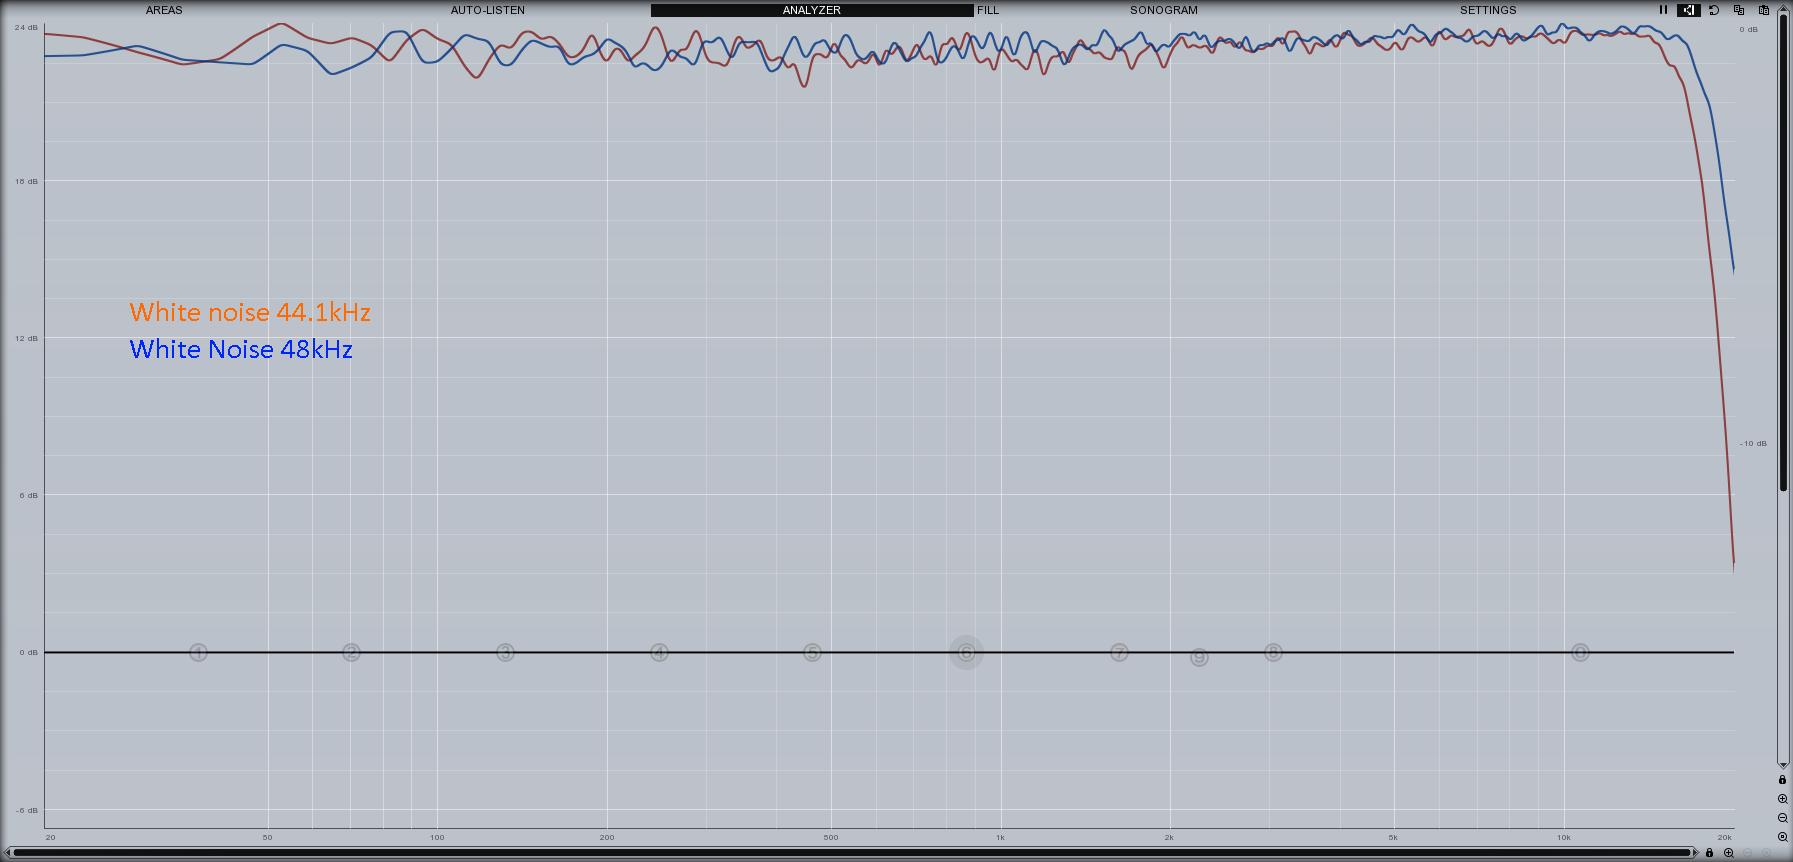 Quality of Audio Resampler Driver - RetroArch - Libretro Forums